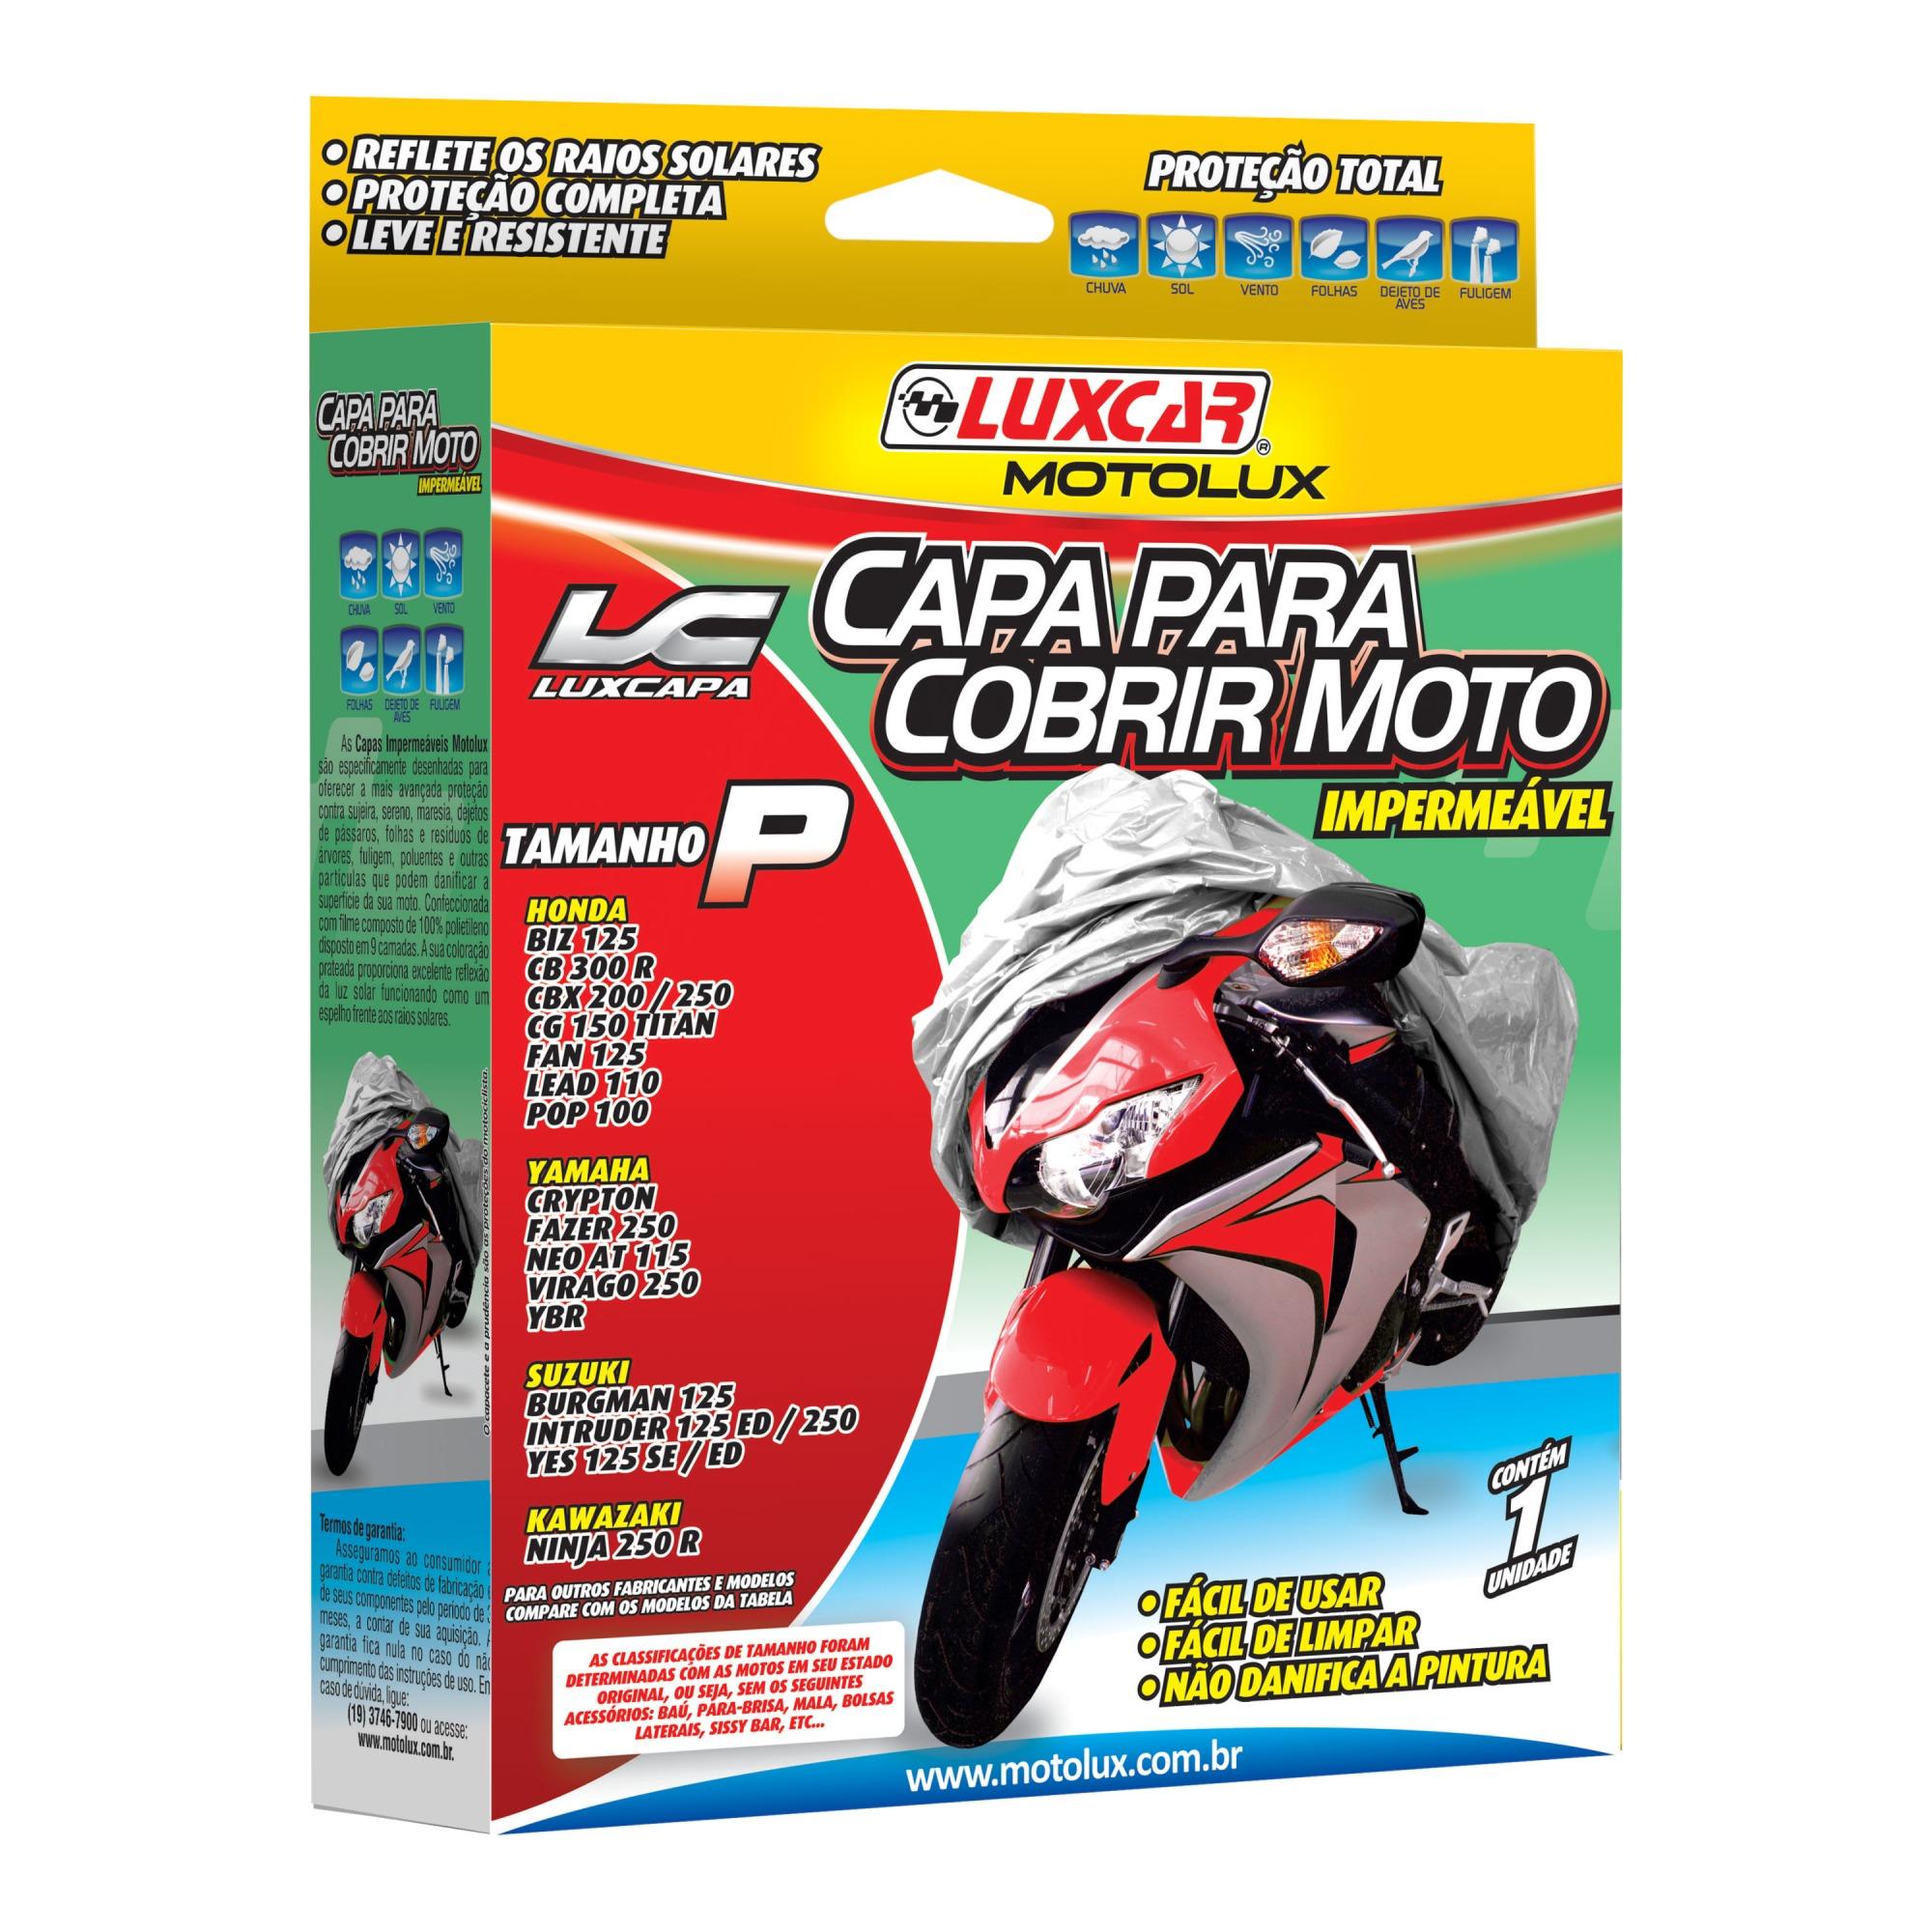 Capa Protetora para Moto Tamanho P 120 x 163m - Luxcar